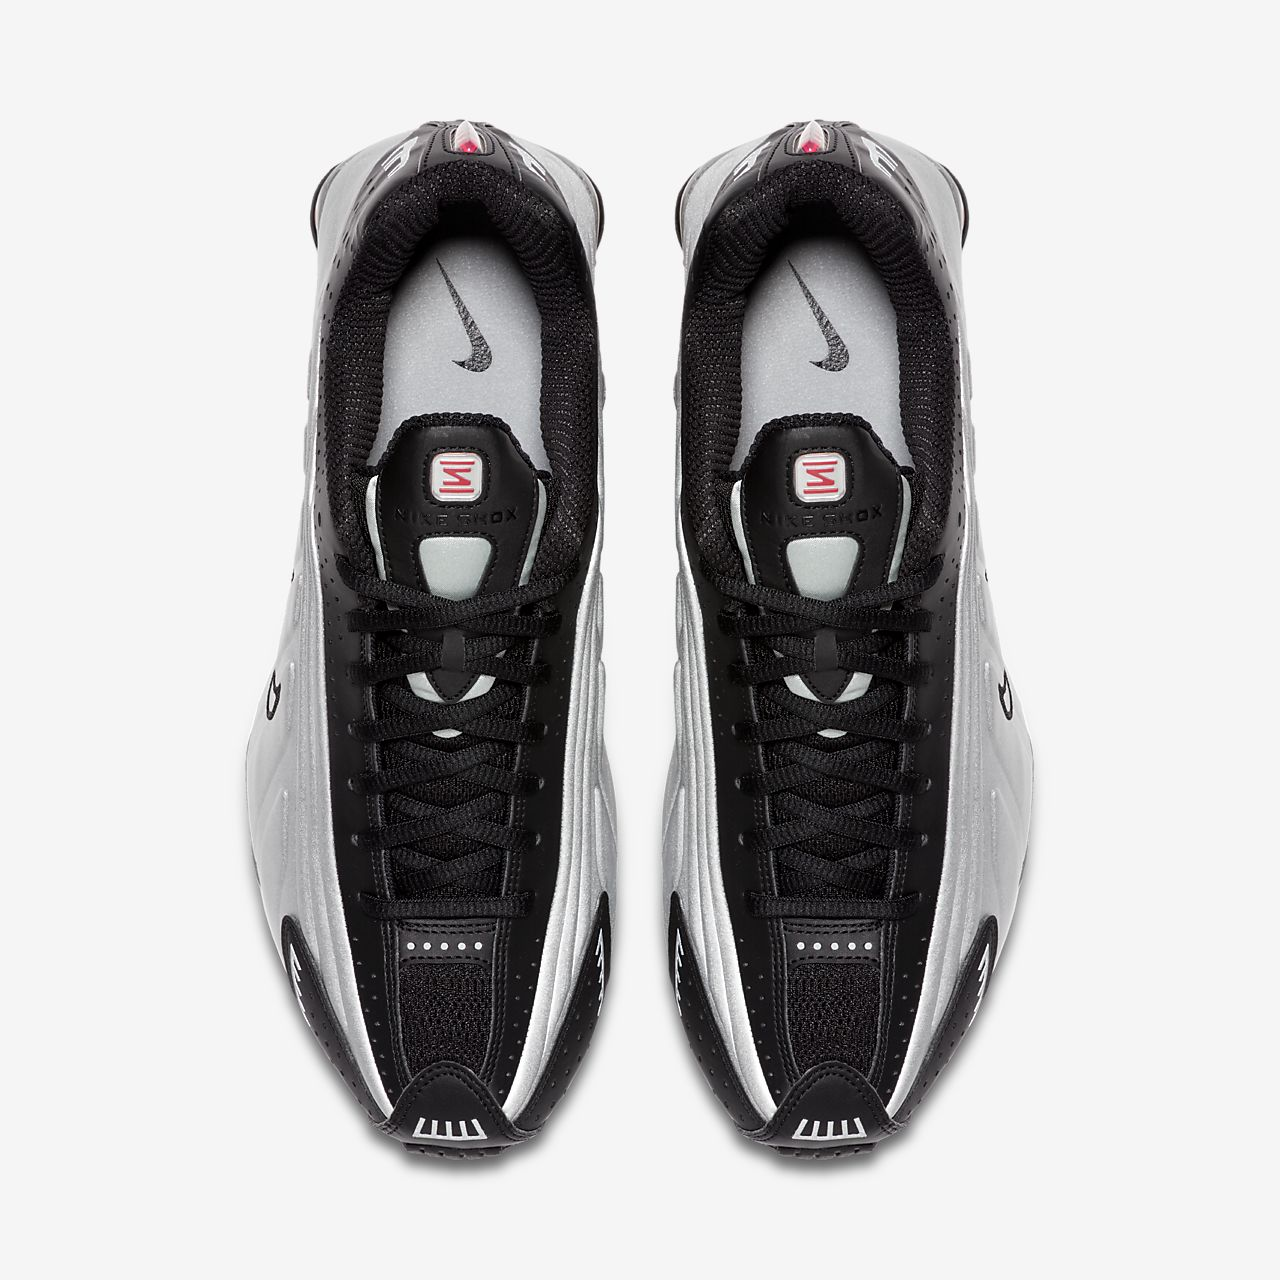 Nike Shox R4 x Neymar Jr. Schwarz